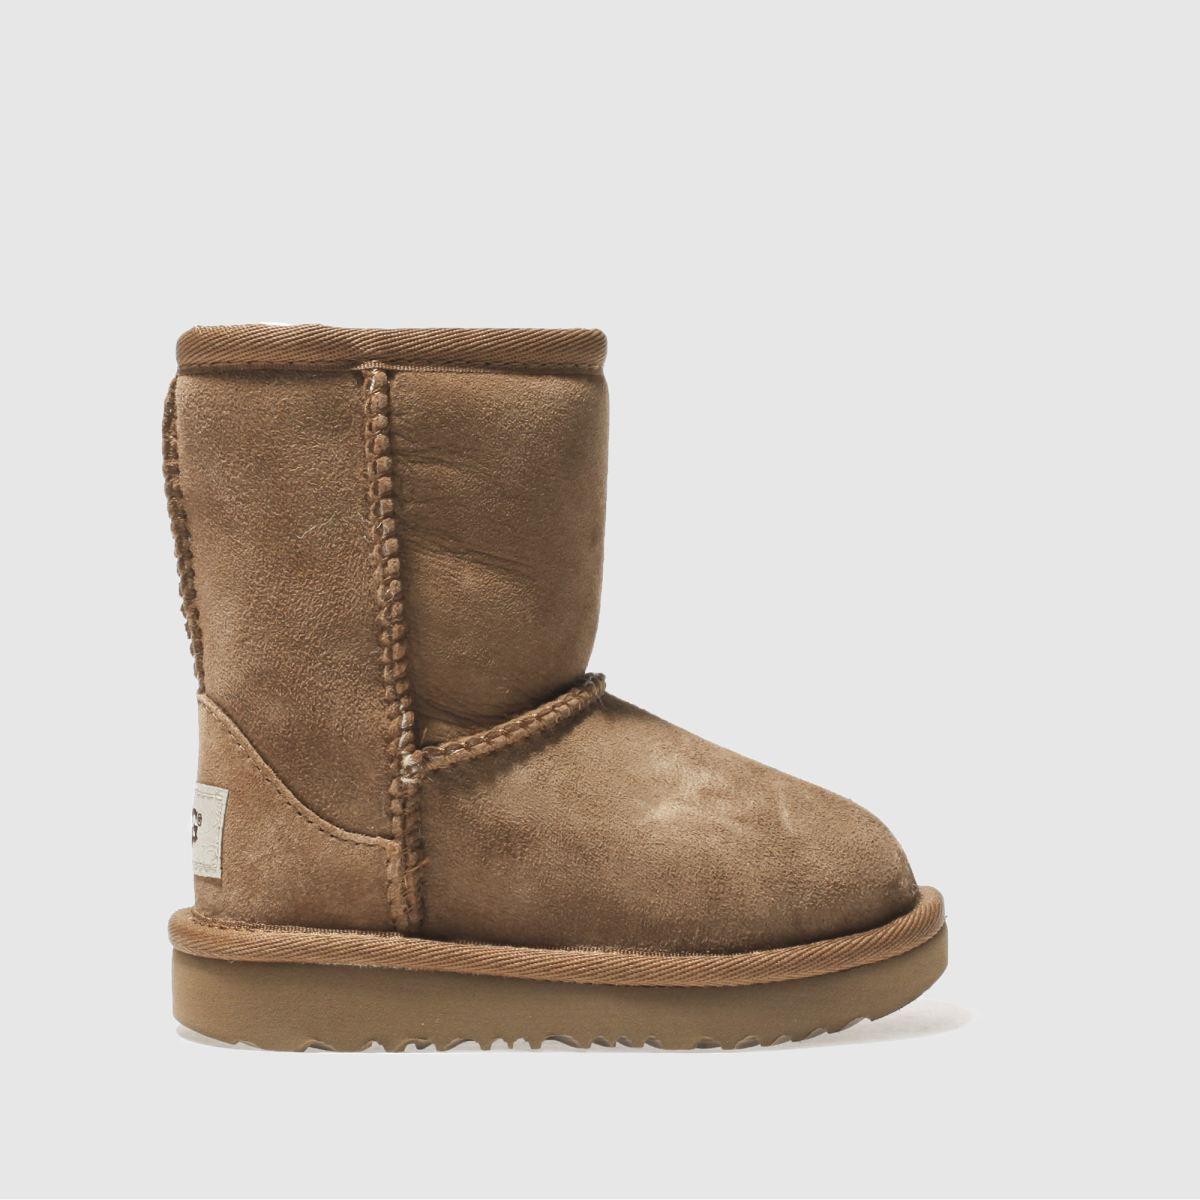 Ugg Tan Classic Ii Boots Toddler